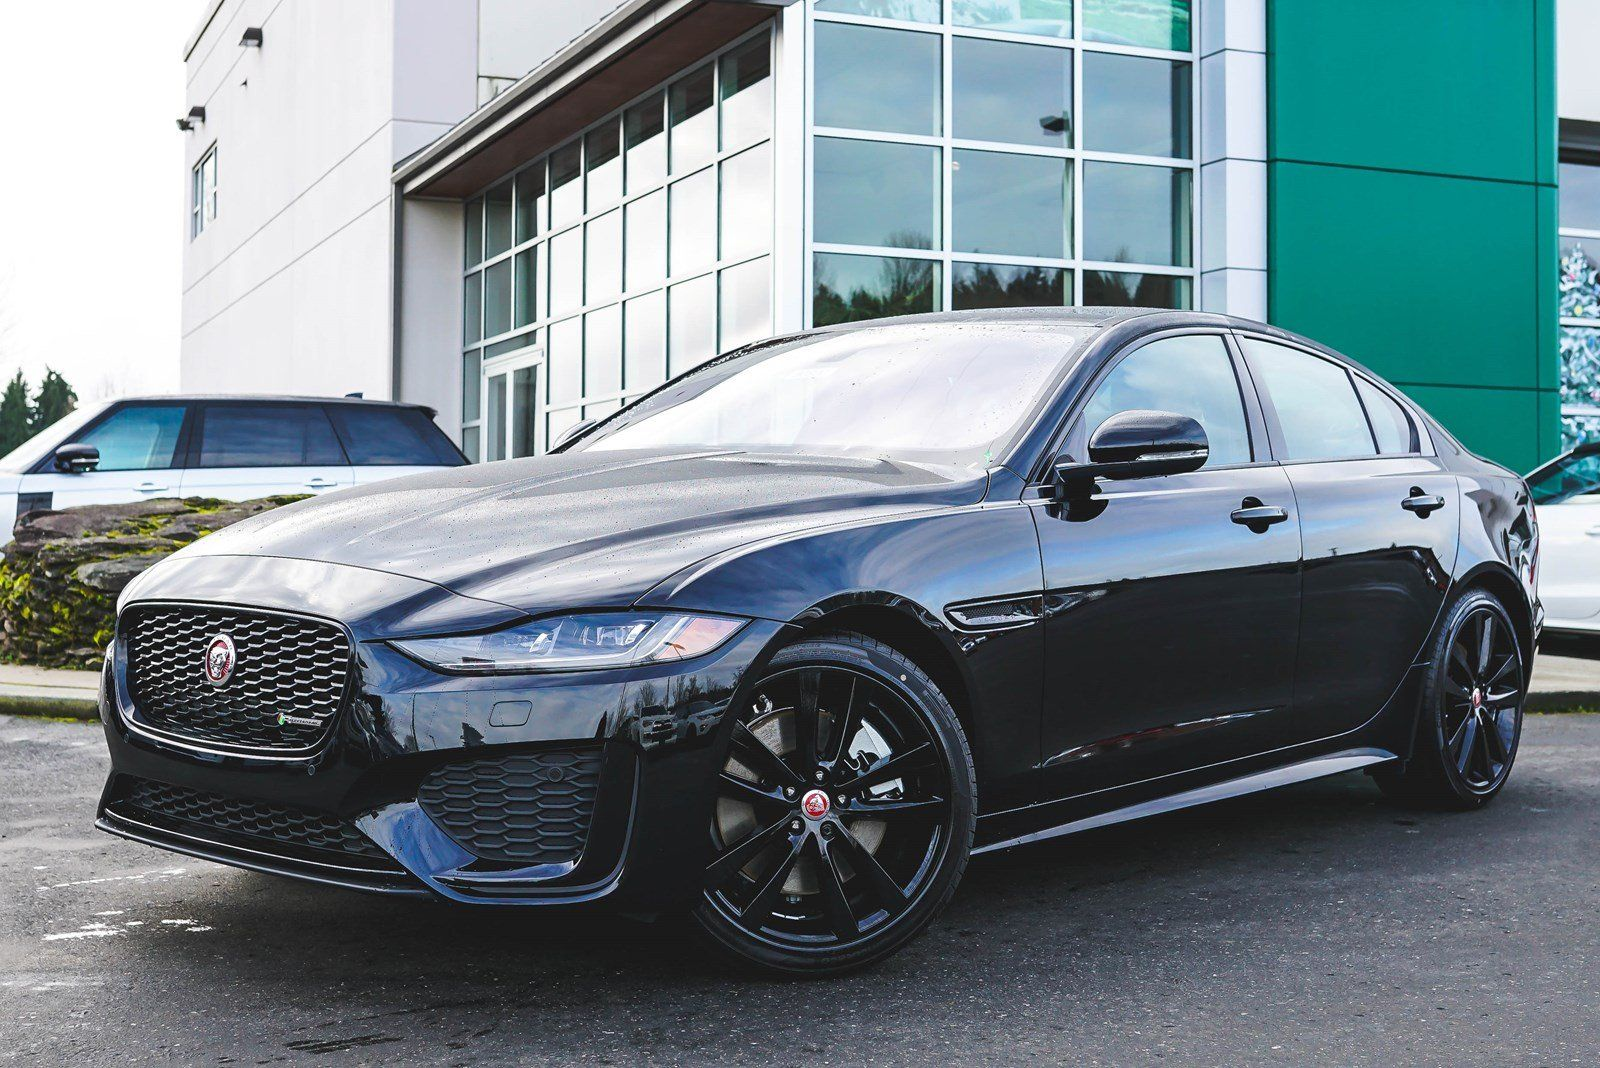 31 New Cars Suvs In Stock Redmond Jaguar Bellevue Jaguar Xe Jaguar Jaguar Car